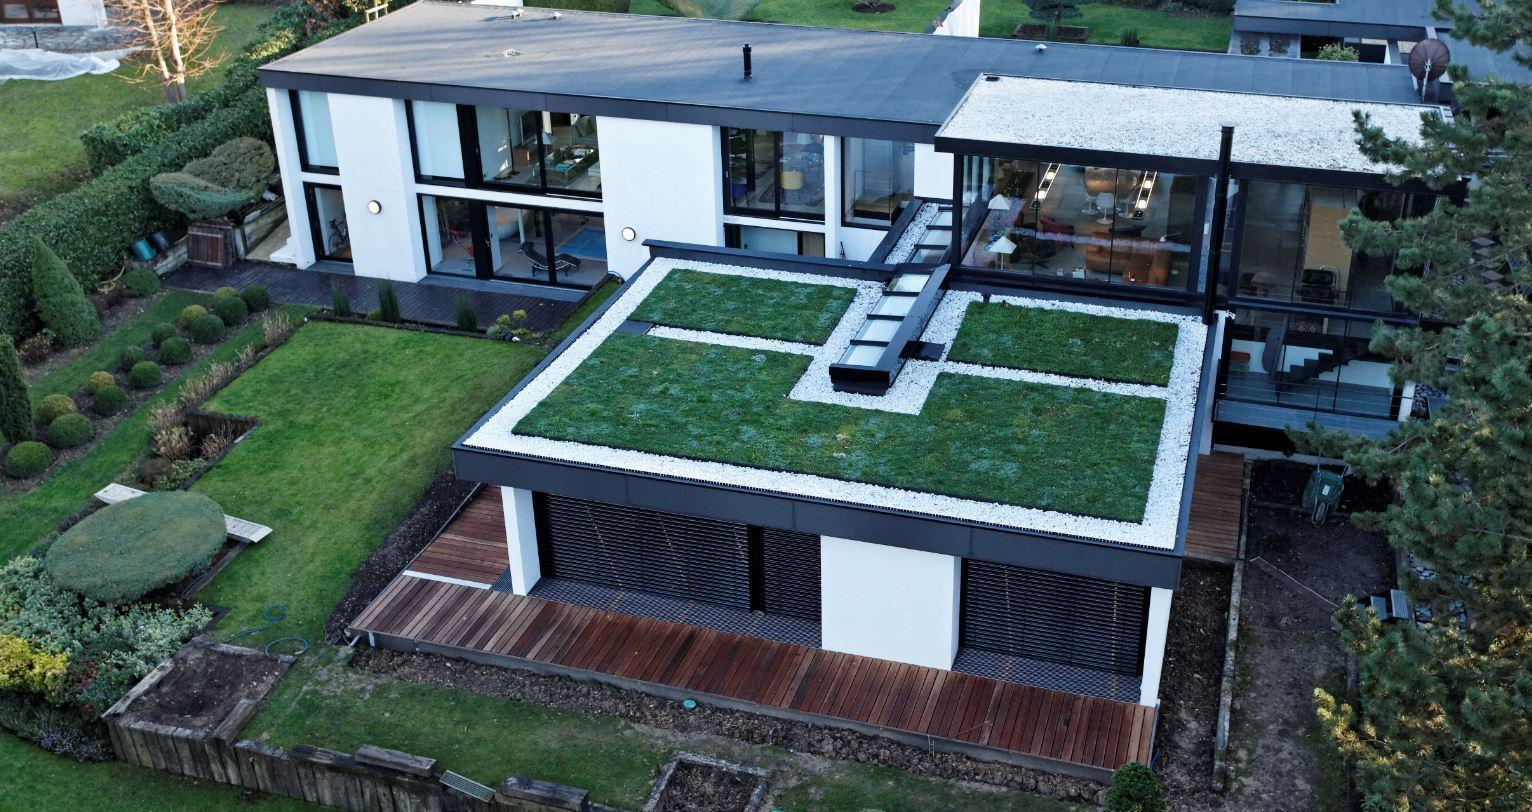 ibv - icopal plocha strecha - Ploché strechy